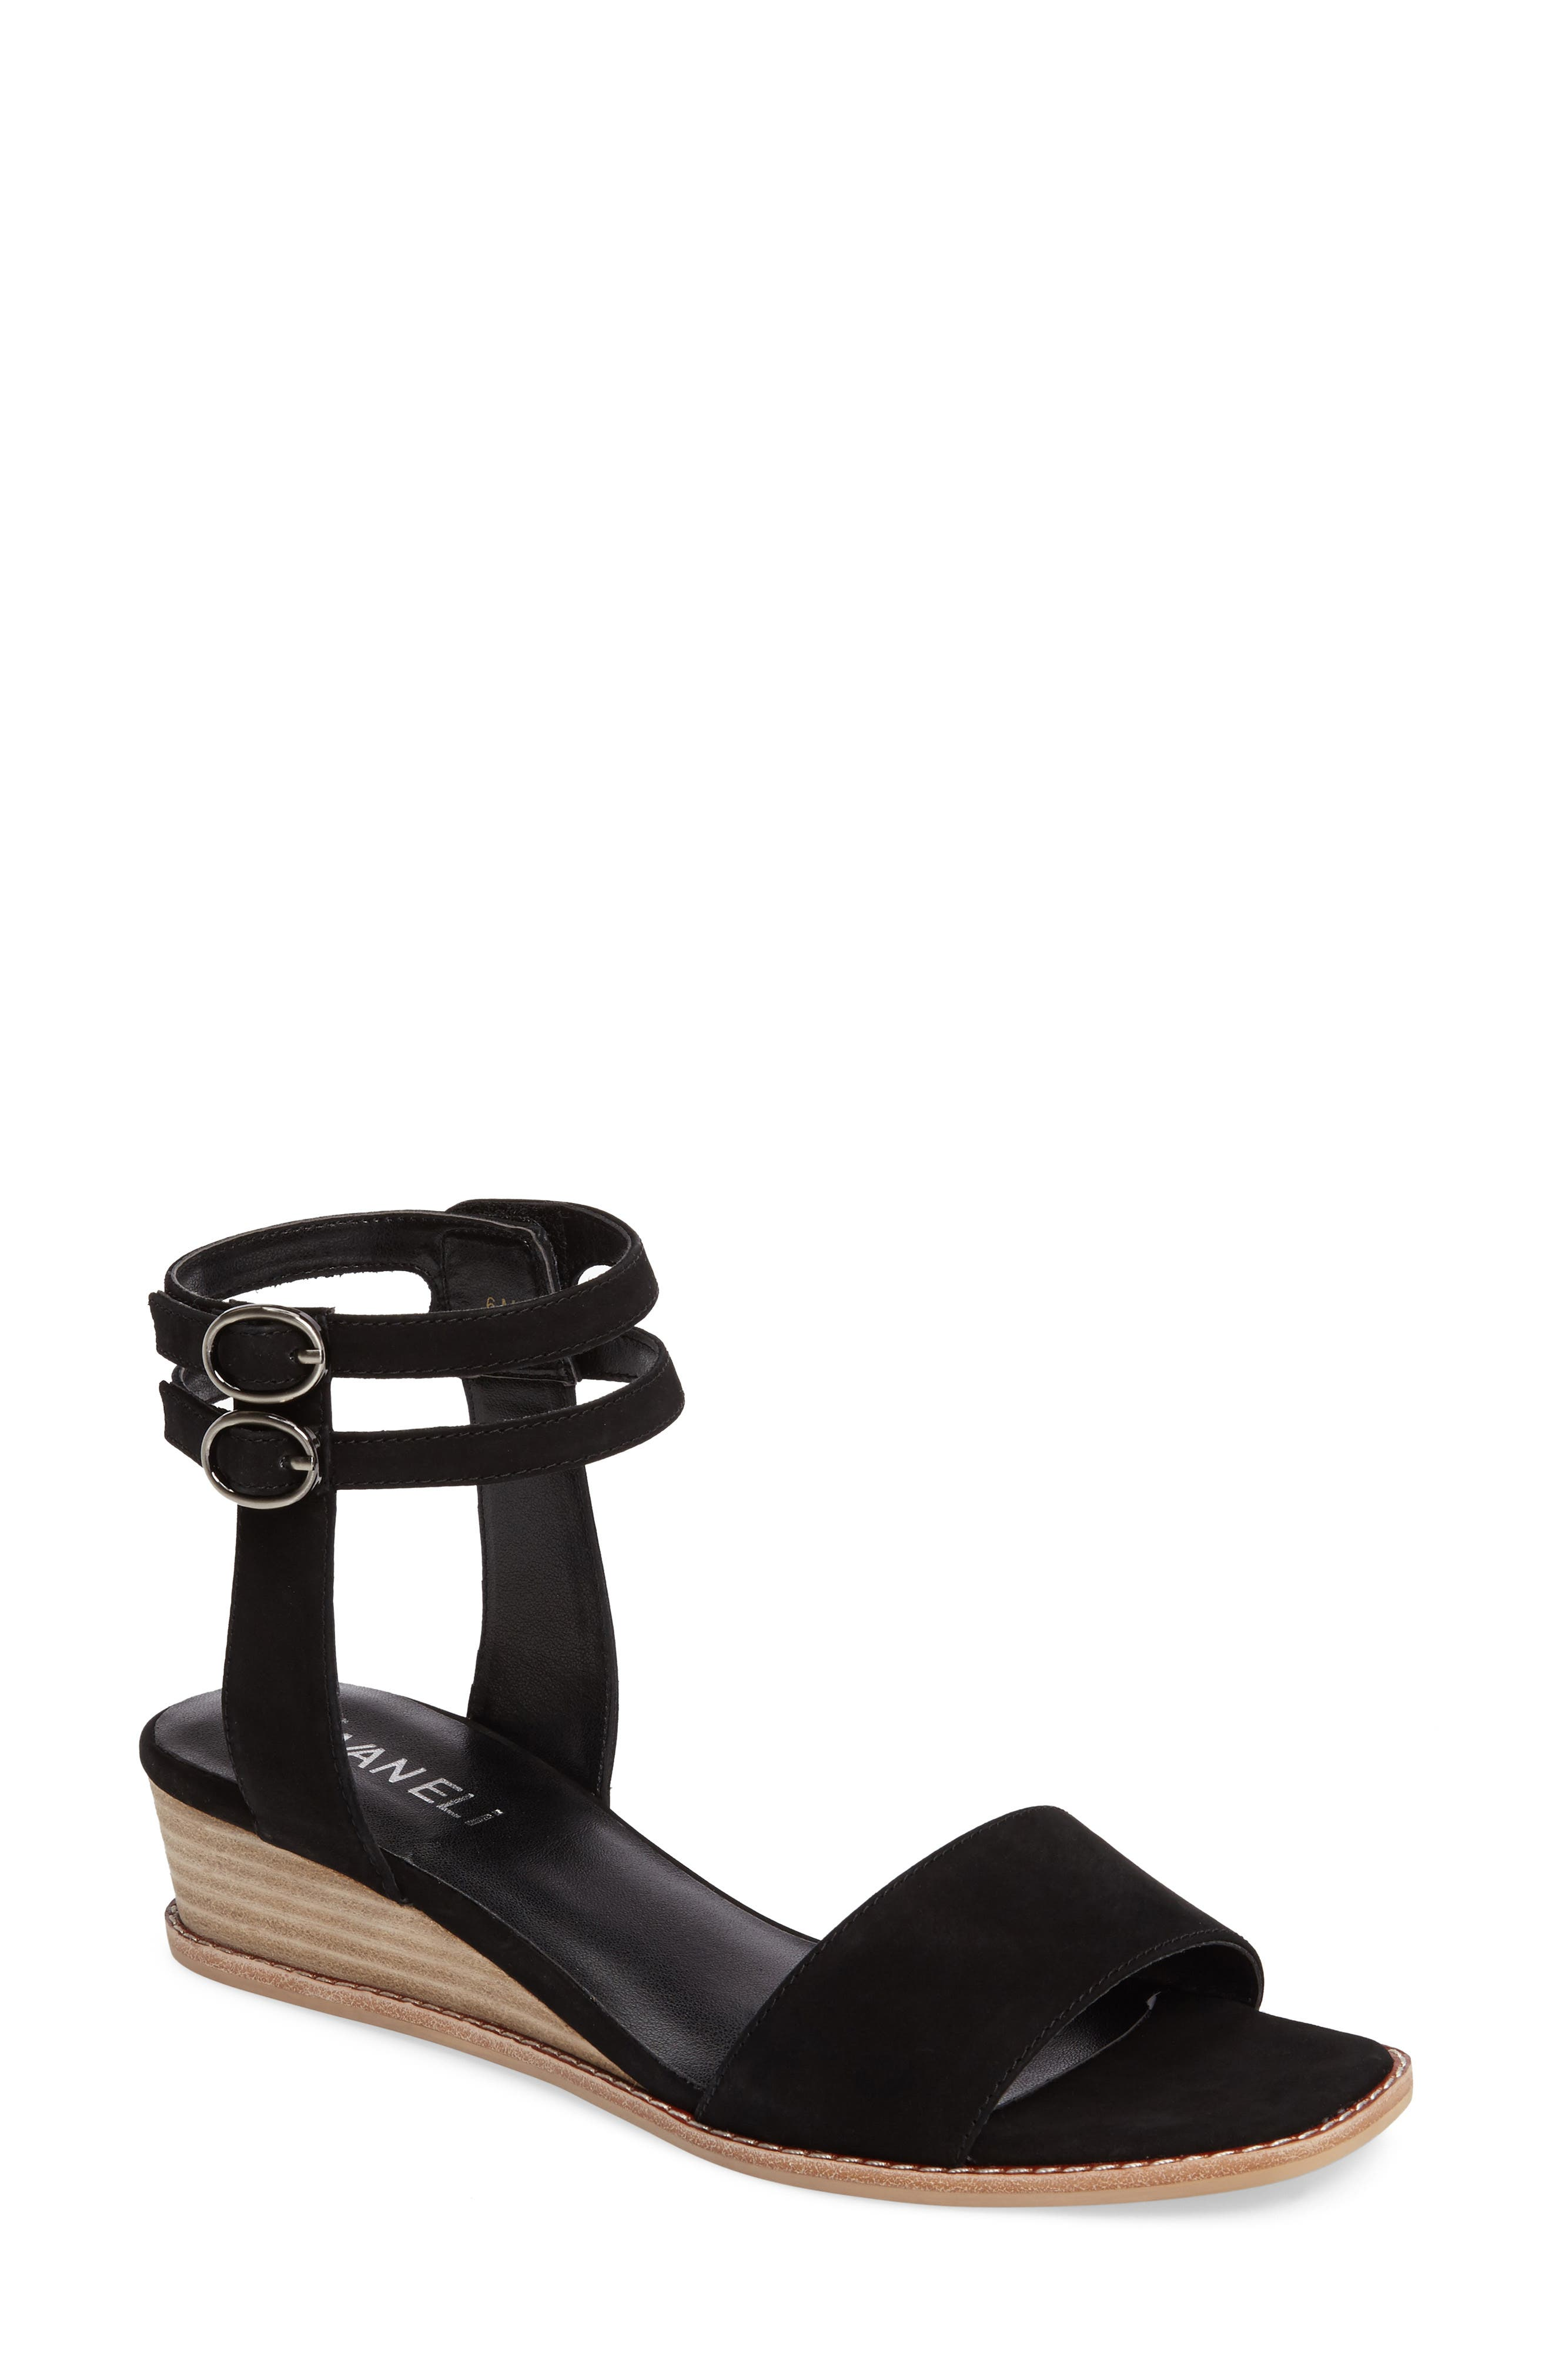 Jarita Ankle Strap Sandal,                         Main,                         color, 001